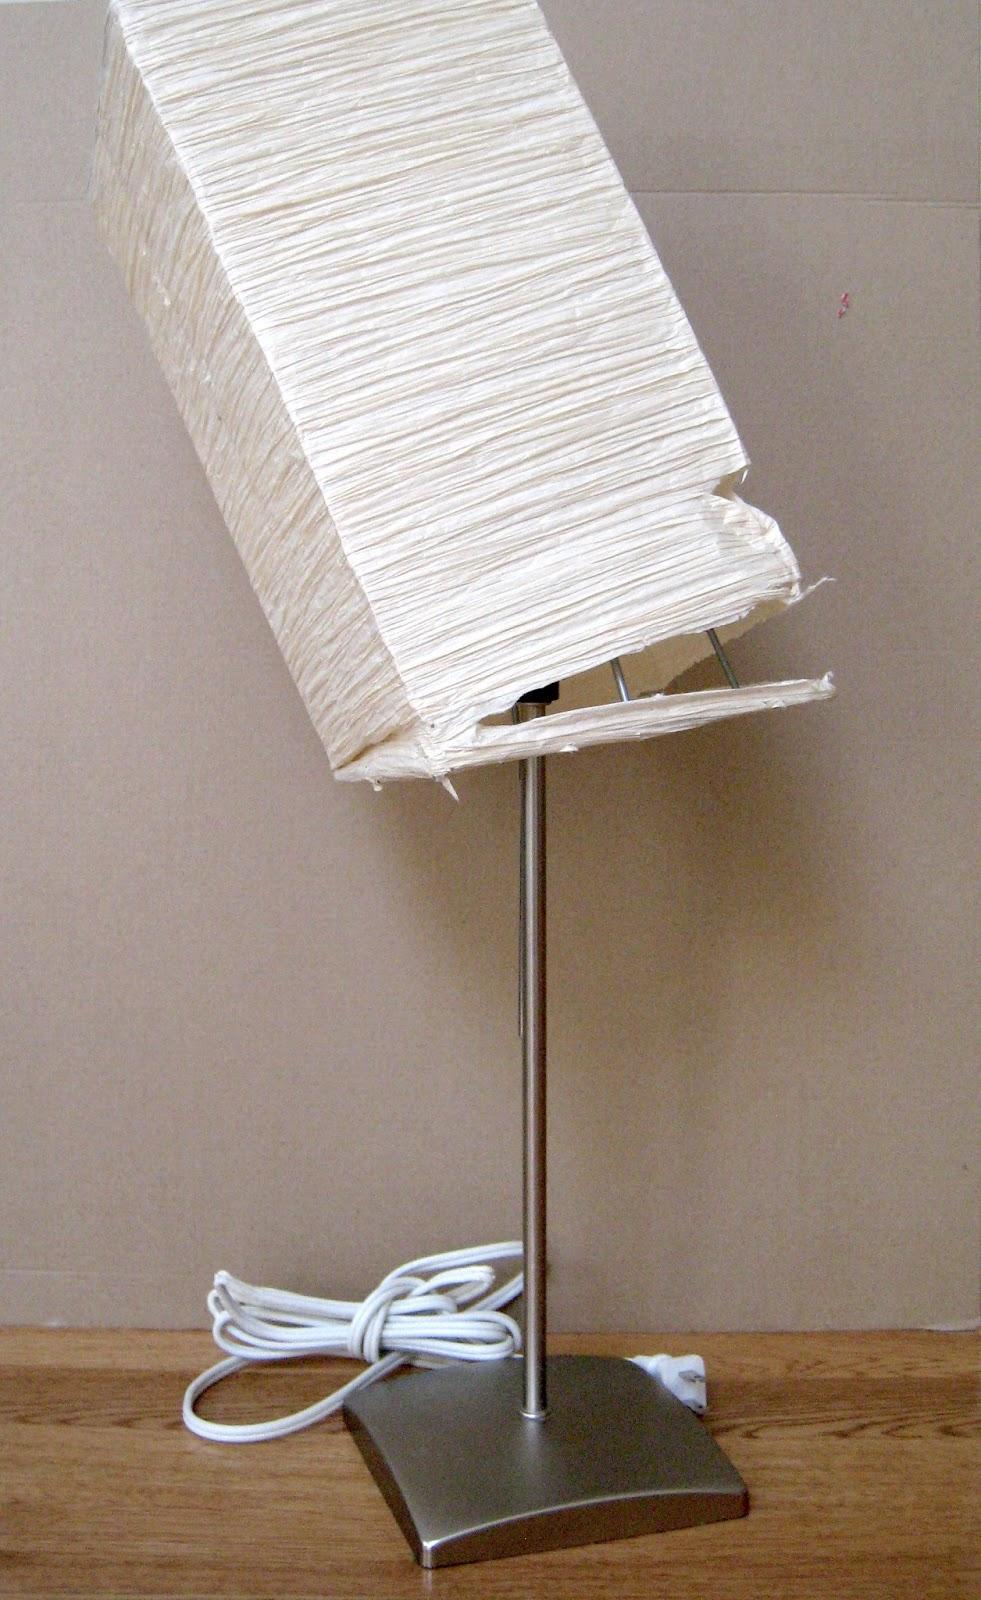 Ikea Lamp Shades | newhairstylesformen2014.com